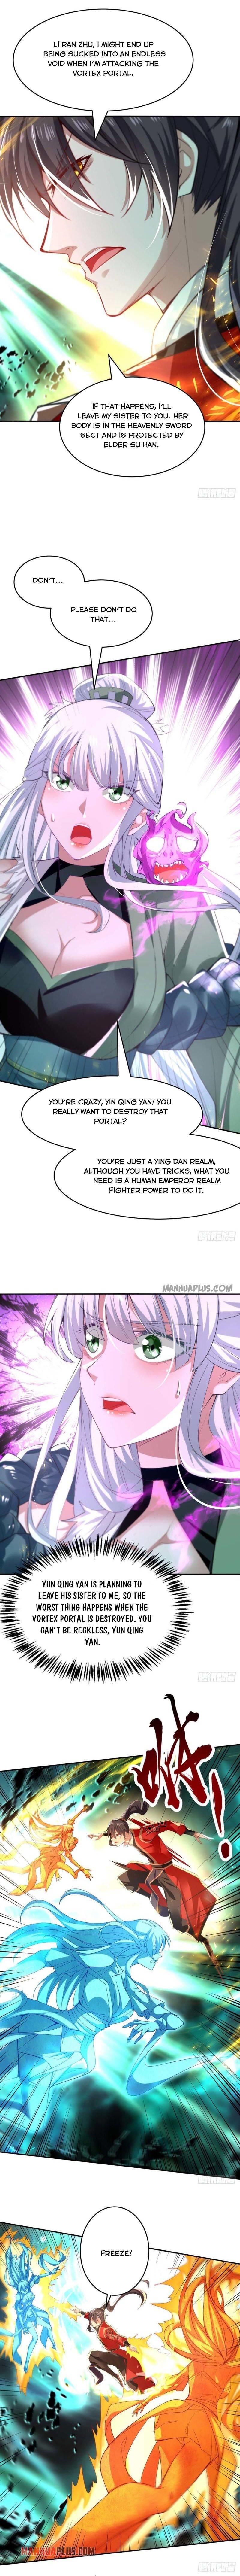 Return Of Immortal Emperor Chapter 215 page 2 - Mangakakalots.com